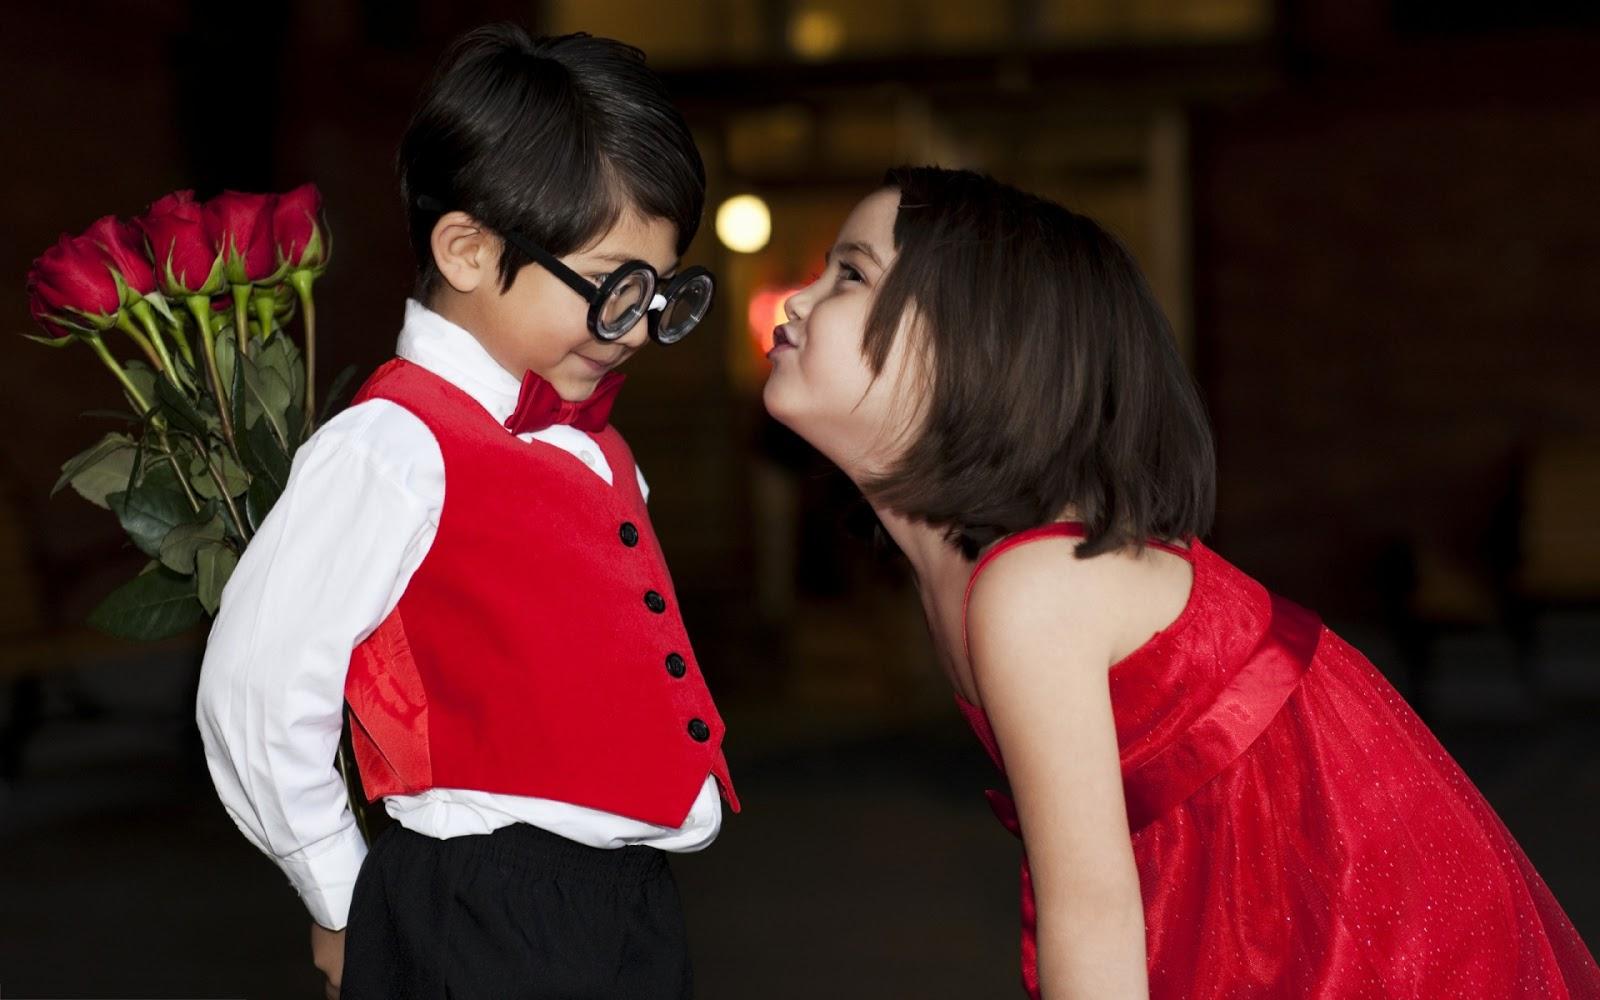 http://3.bp.blogspot.com/-nVO_tATq3N0/USWZdYT93fI/AAAAAAAAXCk/zeYQ5on5mBI/s1600/cute-shy-lover.jpg